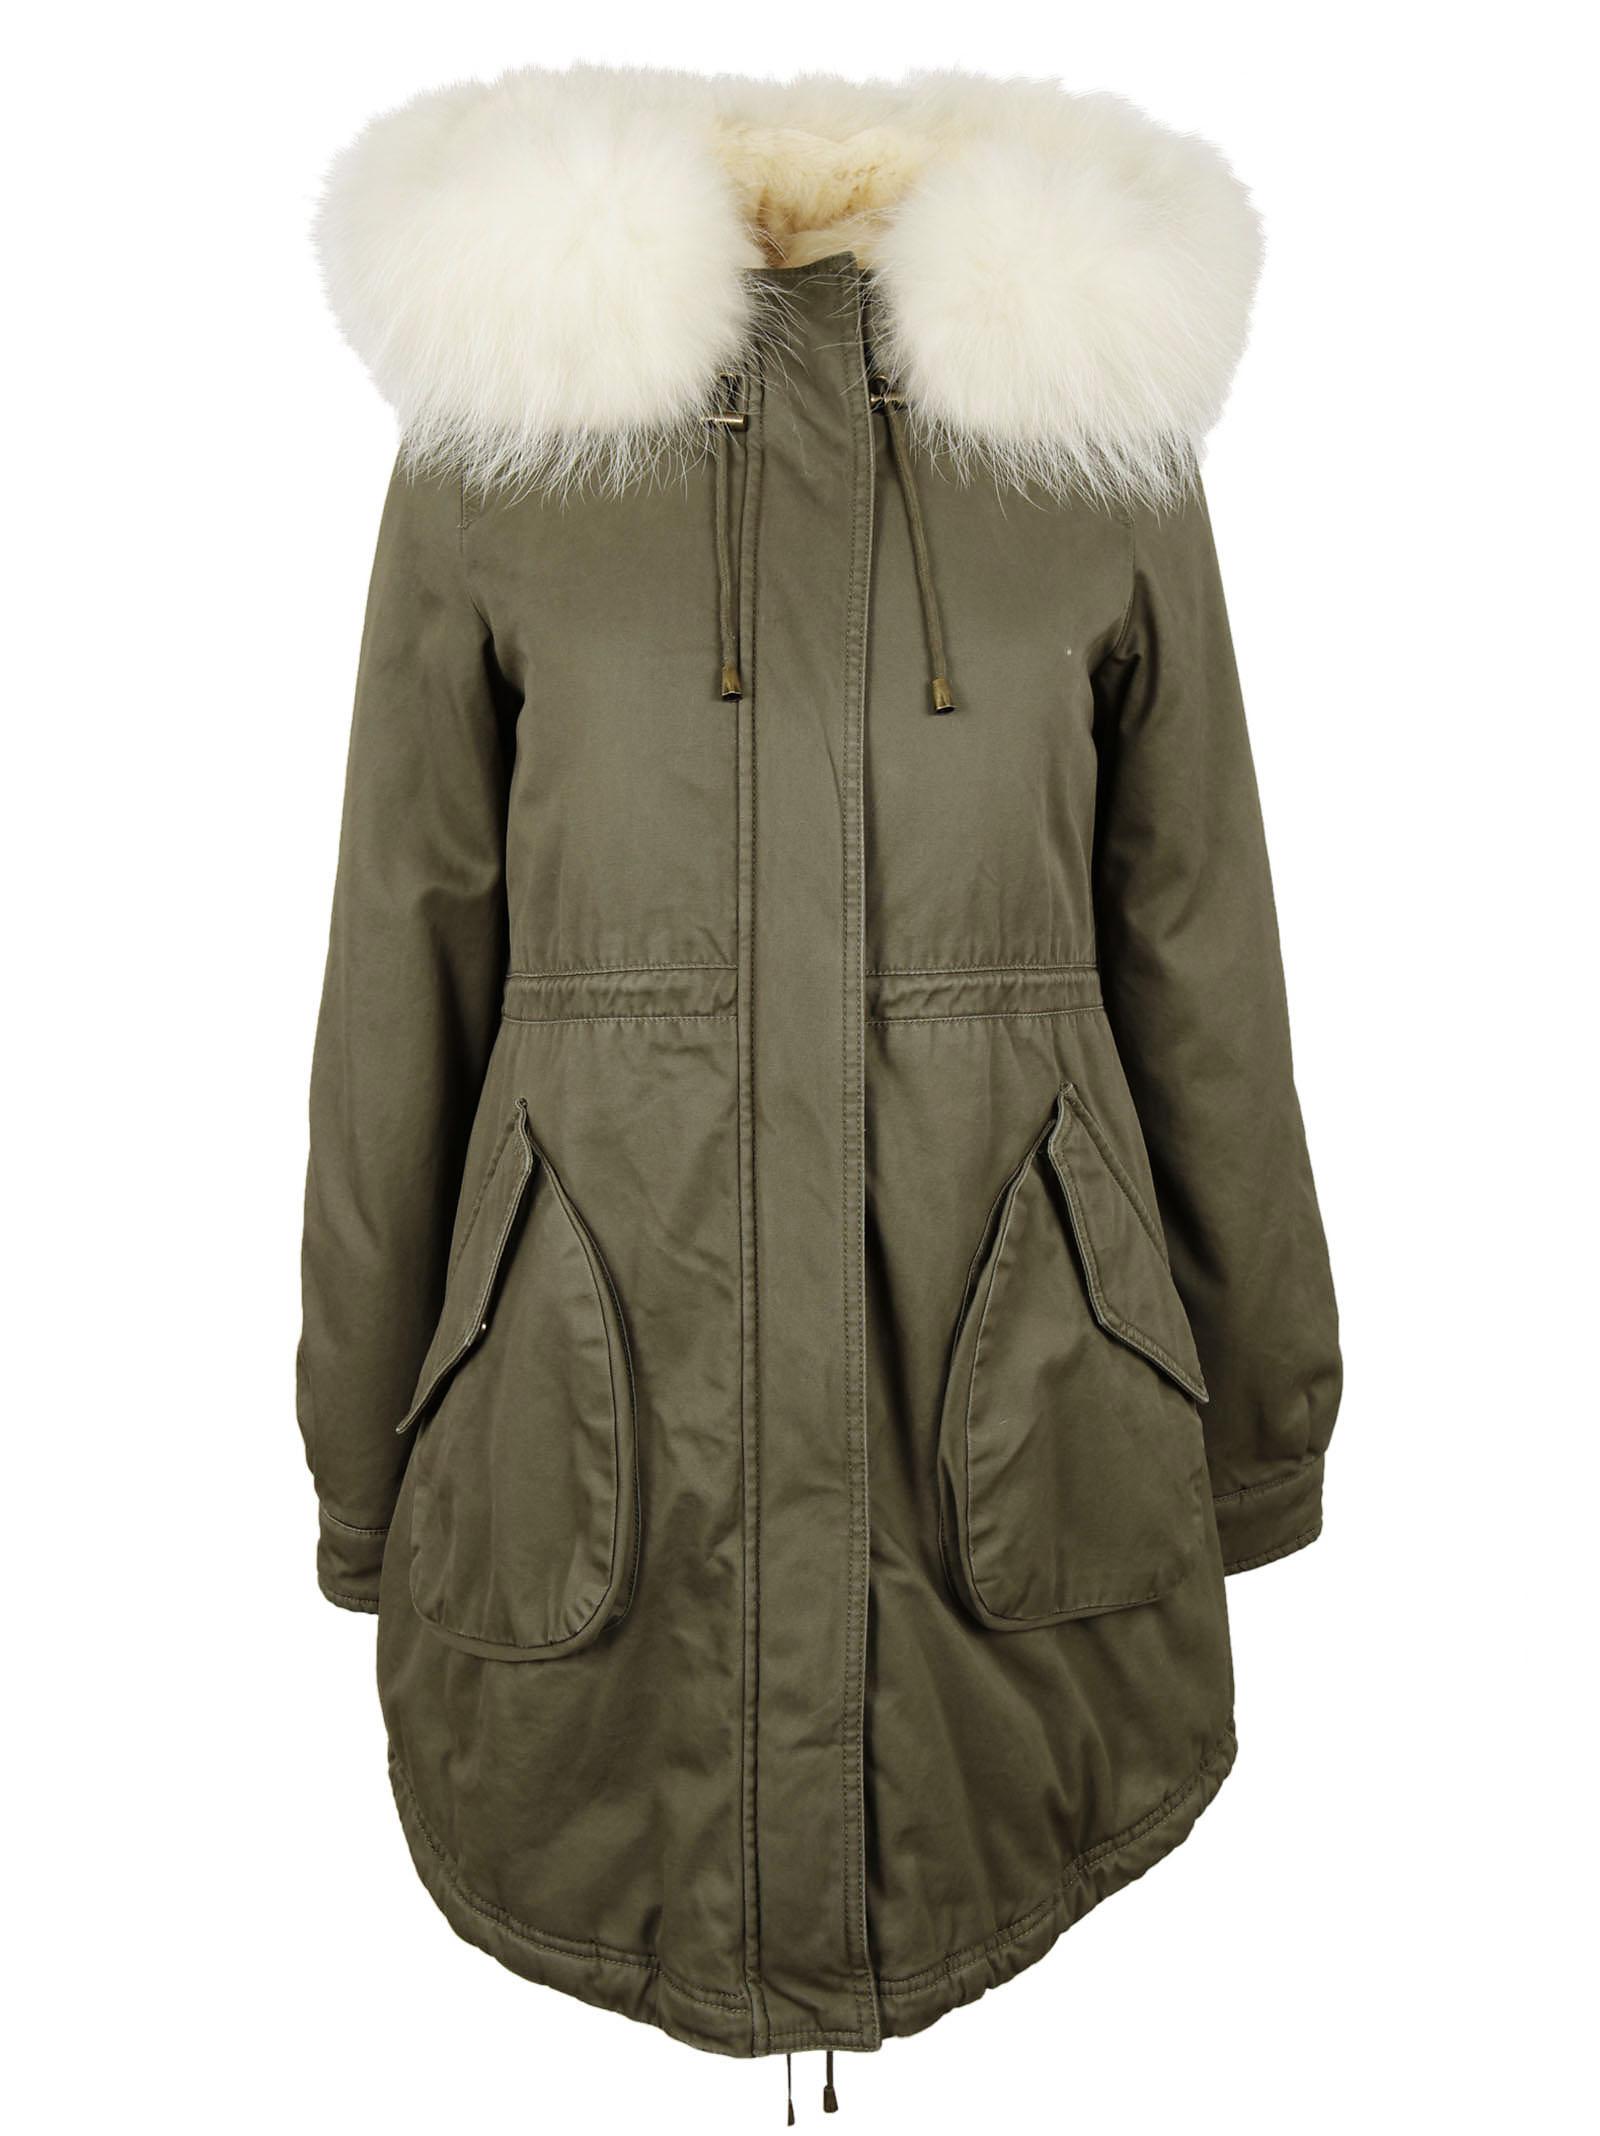 Alessandra Chamonix Alessandra Chamonix Fur Detail Parka